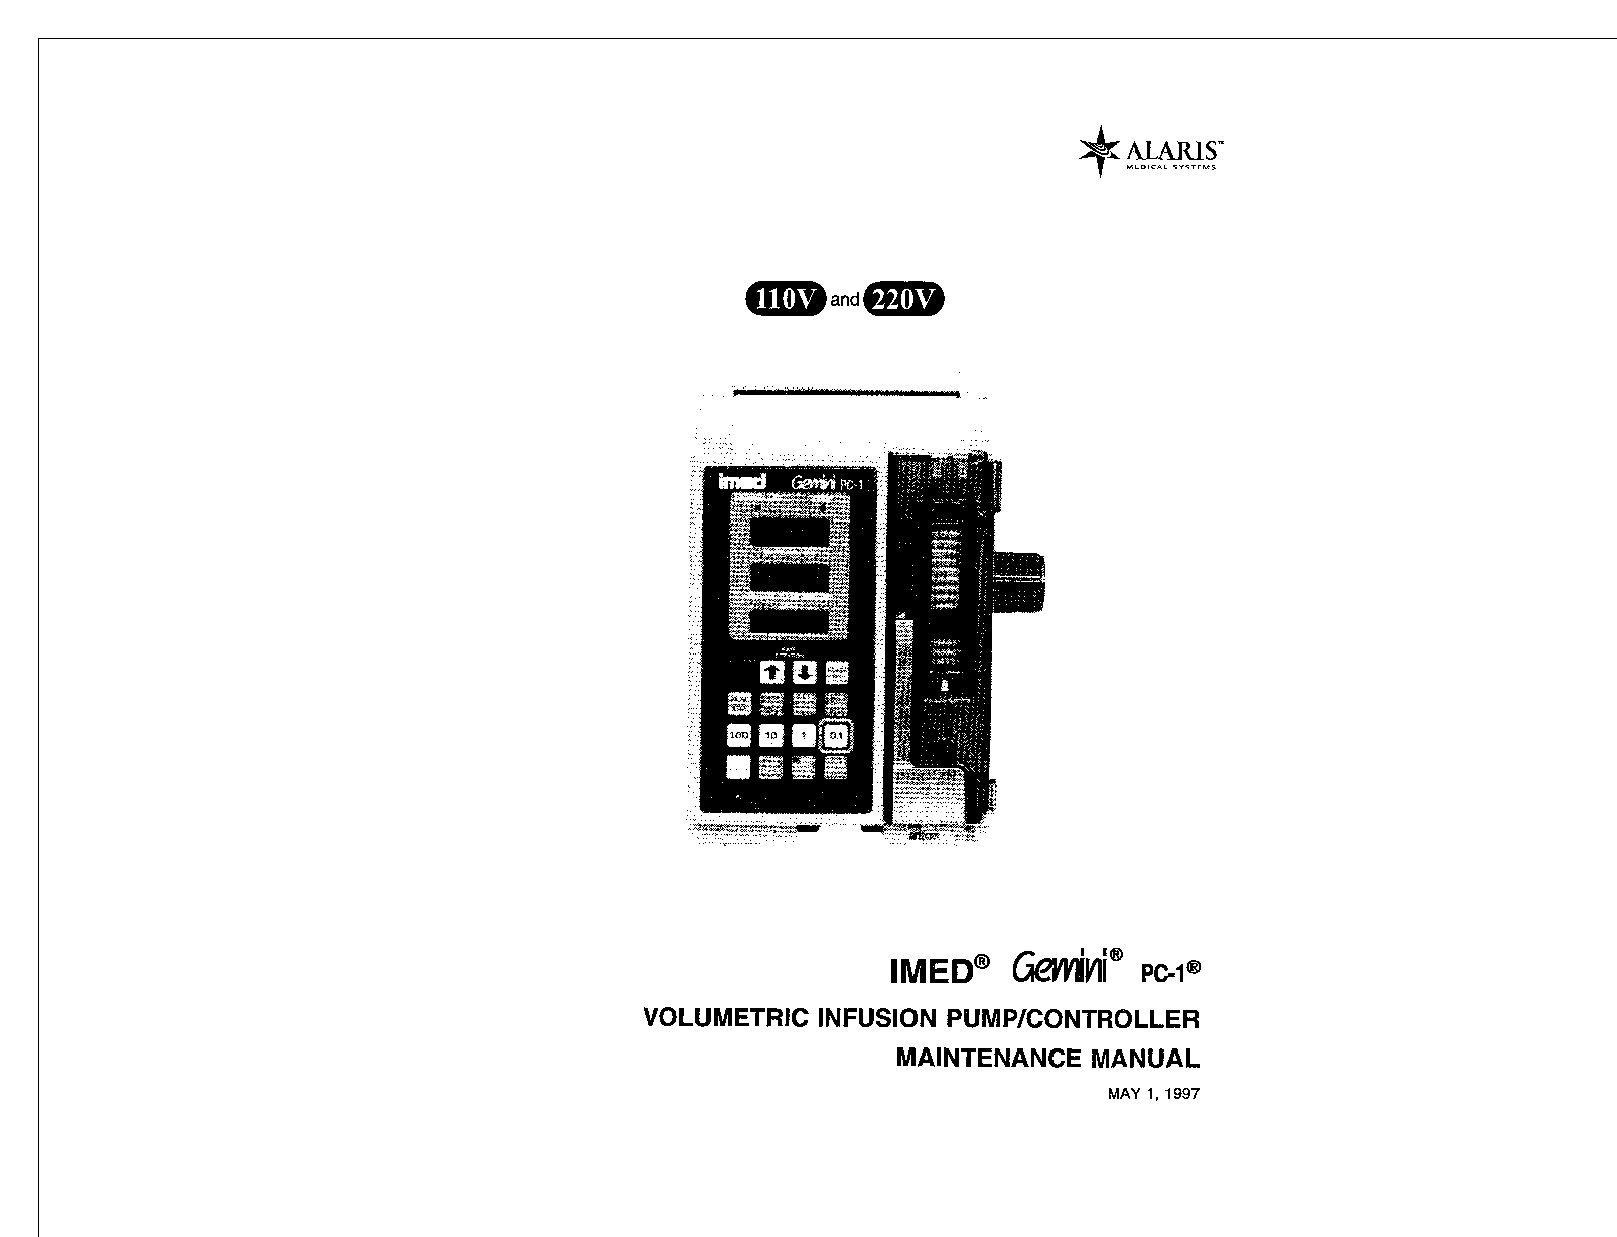 Imed Gemini PC-1 Service manual (1997)